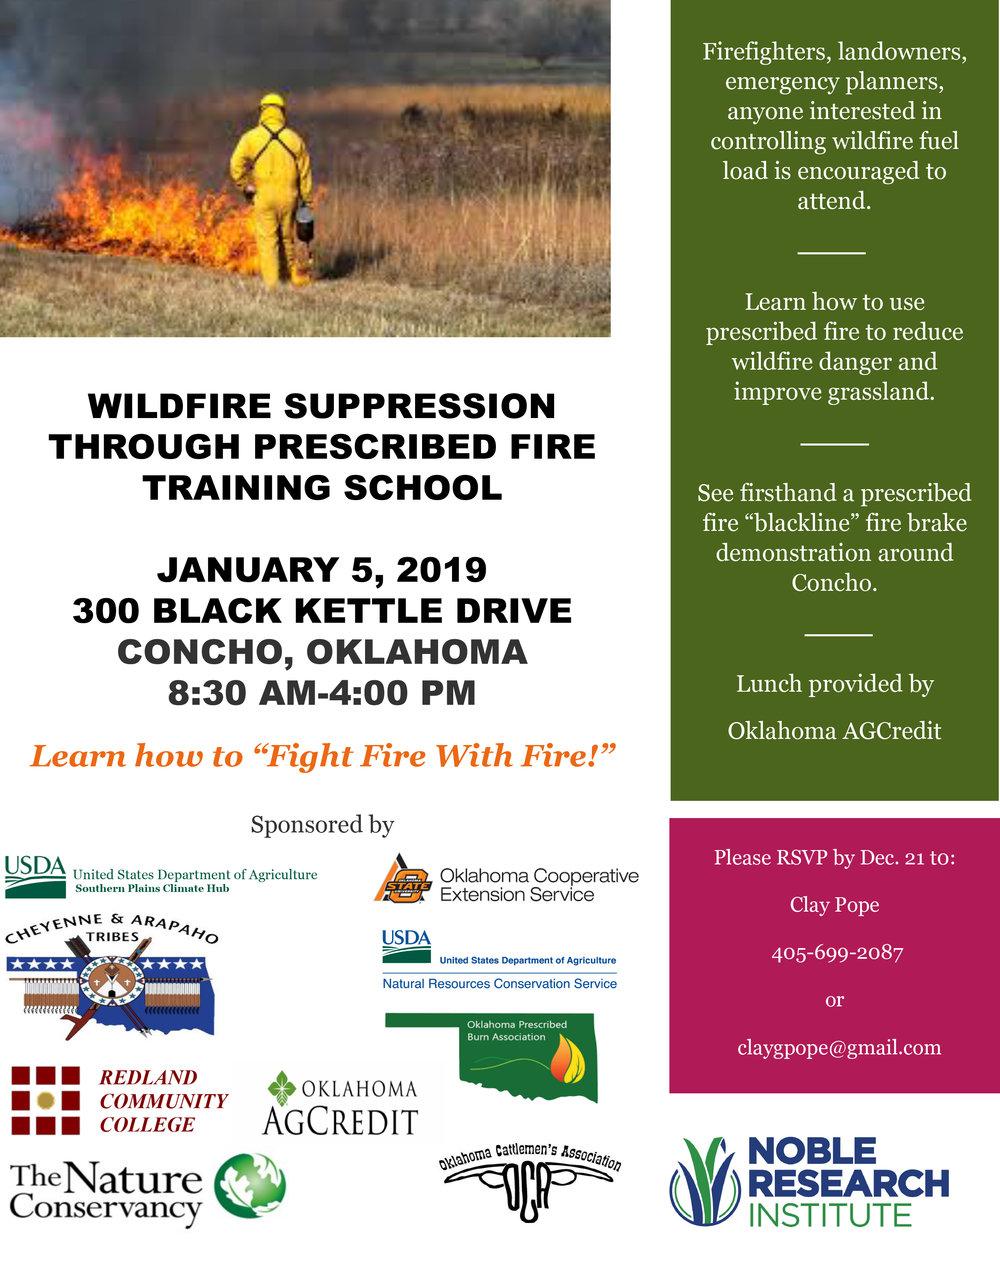 Jan. 5 Prescribed fire-wildfire suppression school flyer.jpg